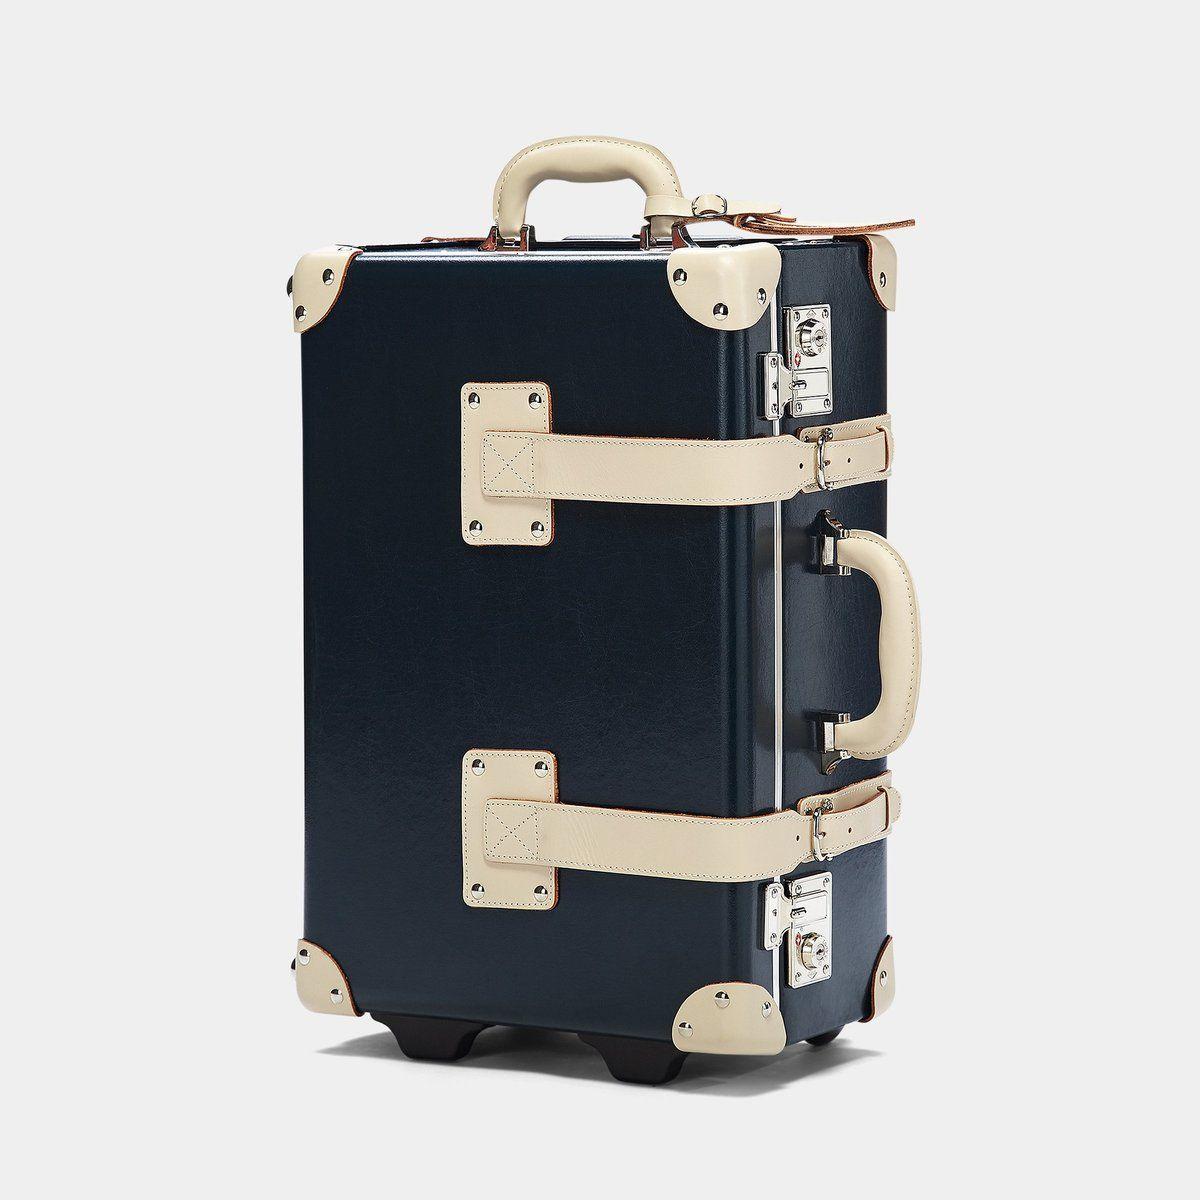 21 Best Rolling Luggage 2020 The Strategist New York Magazine